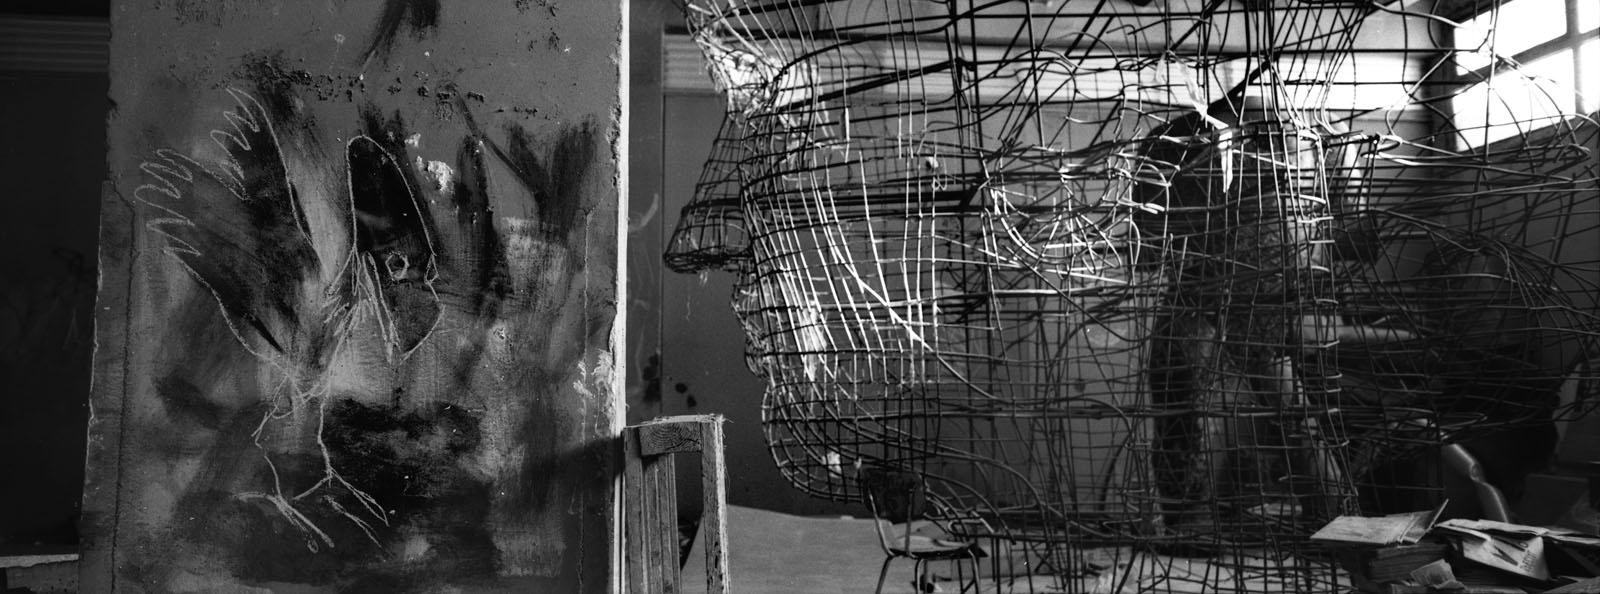 Art and Documentary Photography - Loading 018_Marseille___Fabio_Sgroi.jpg